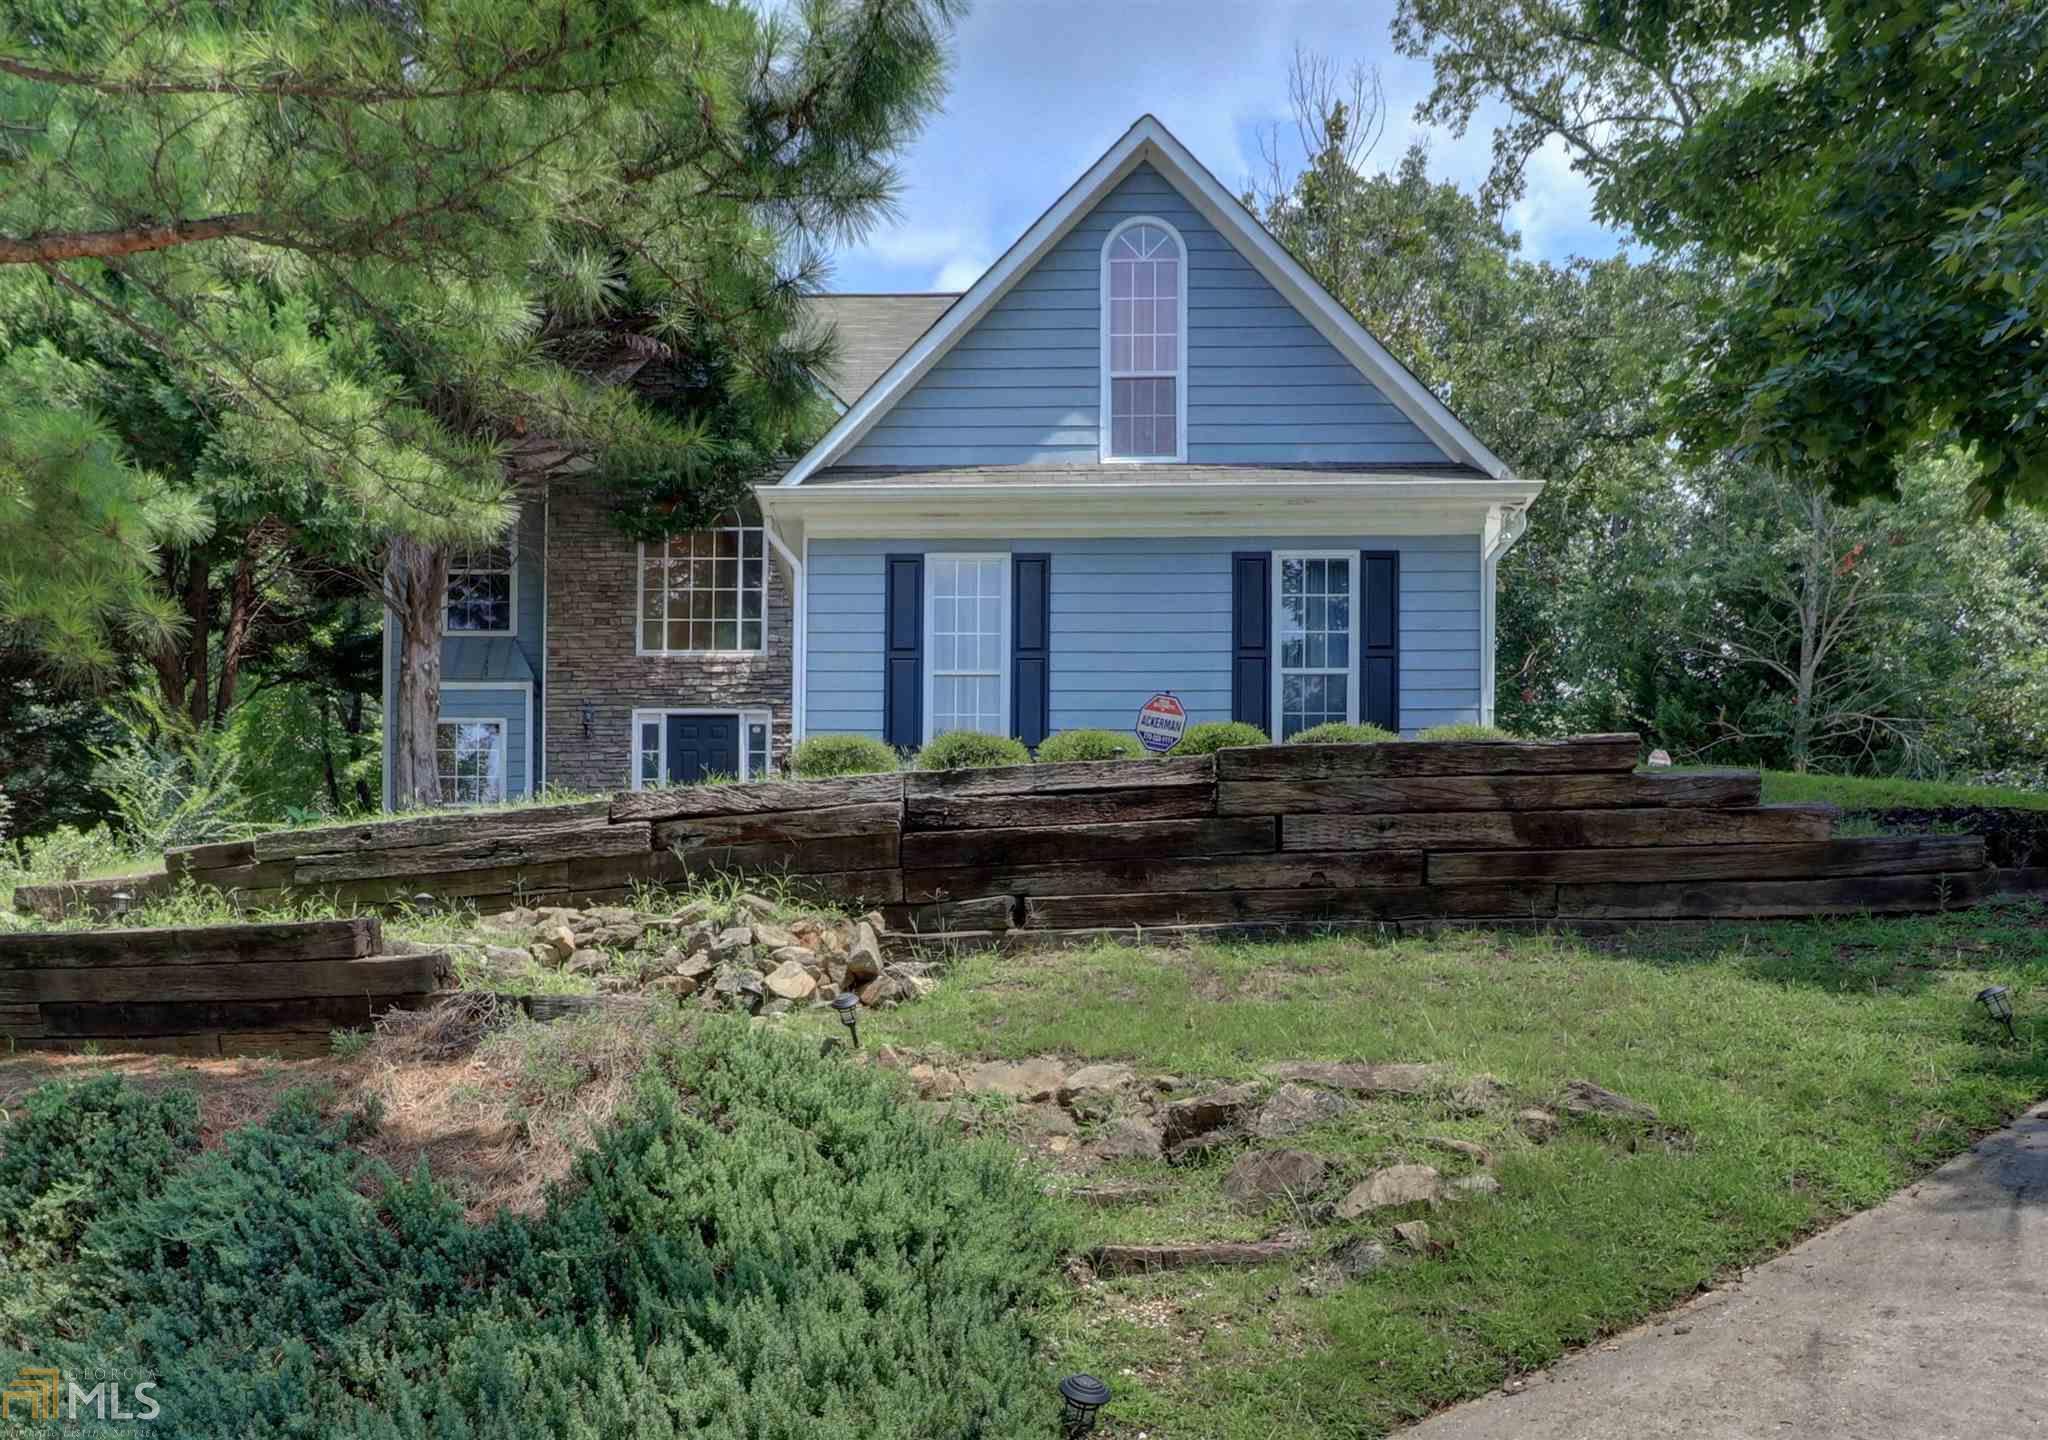 224 Kensington Trce, Stockbridge, GA 30281 (MLS #8227959) :: Premier South Realty, LLC